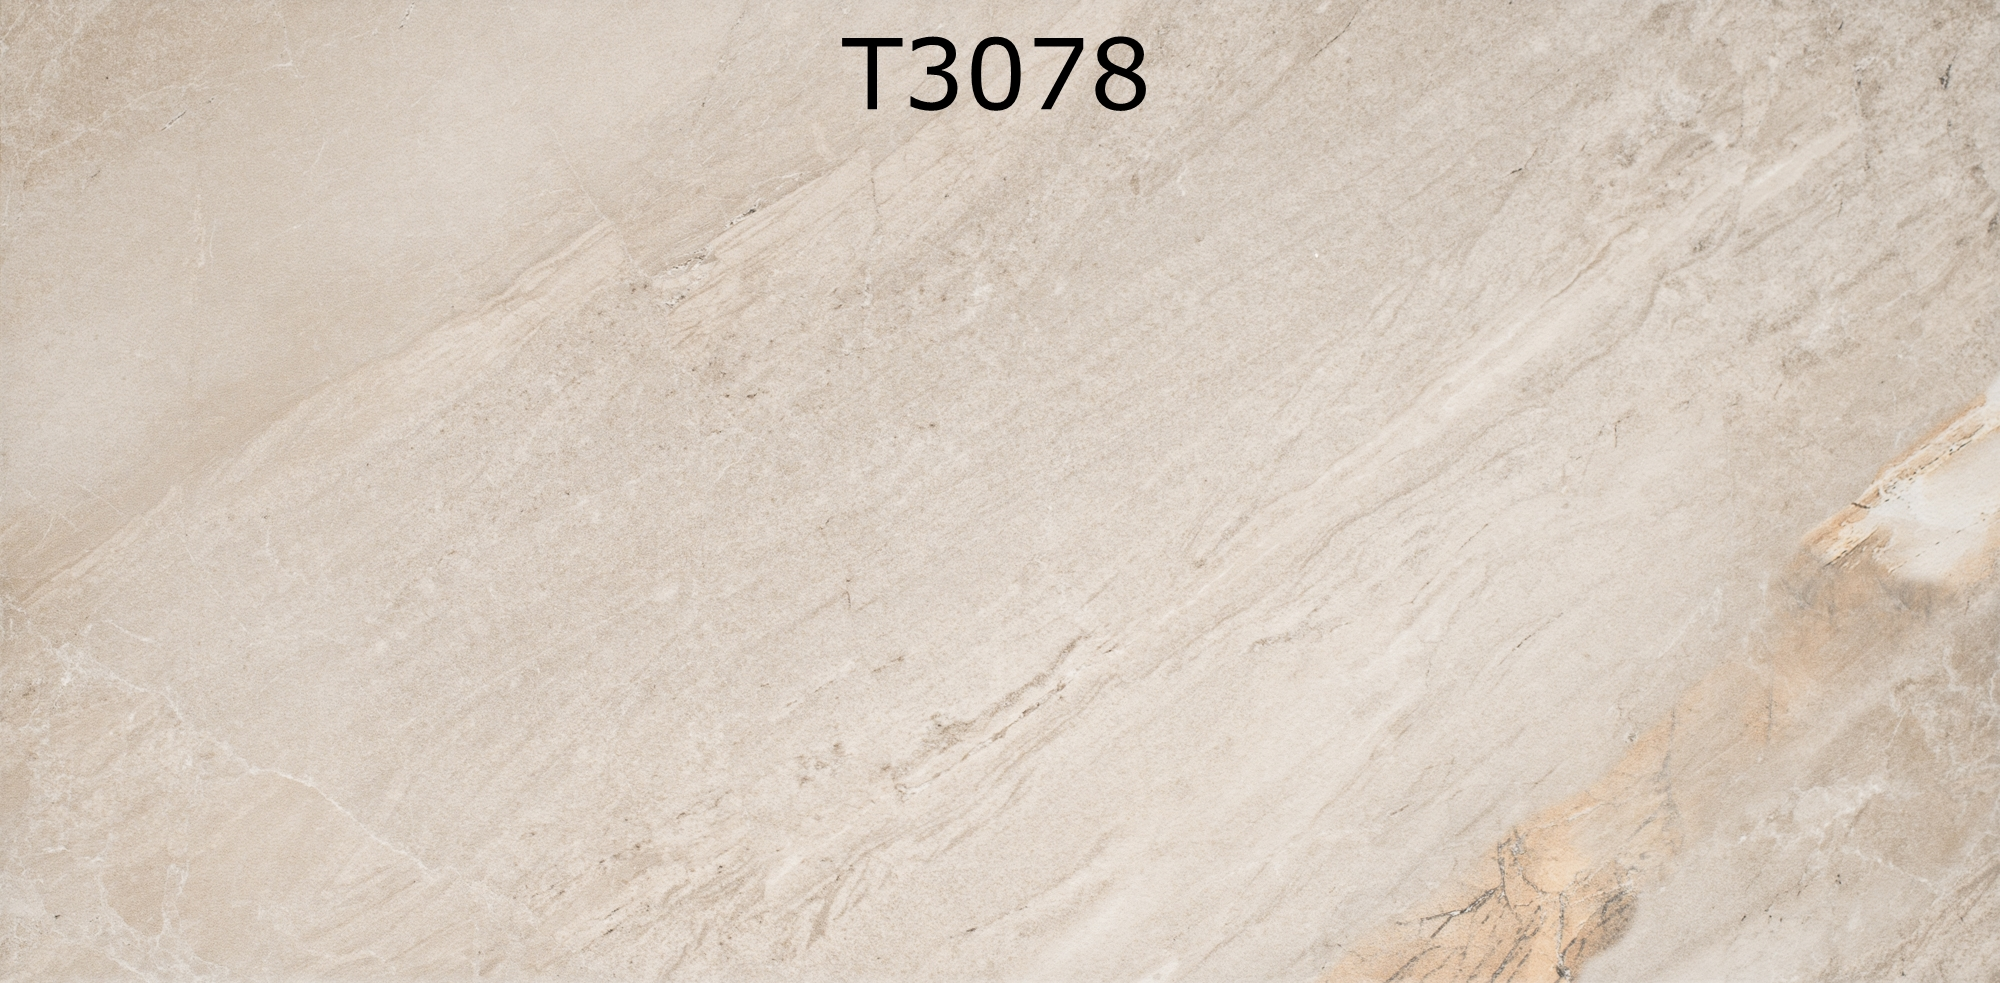 T3078